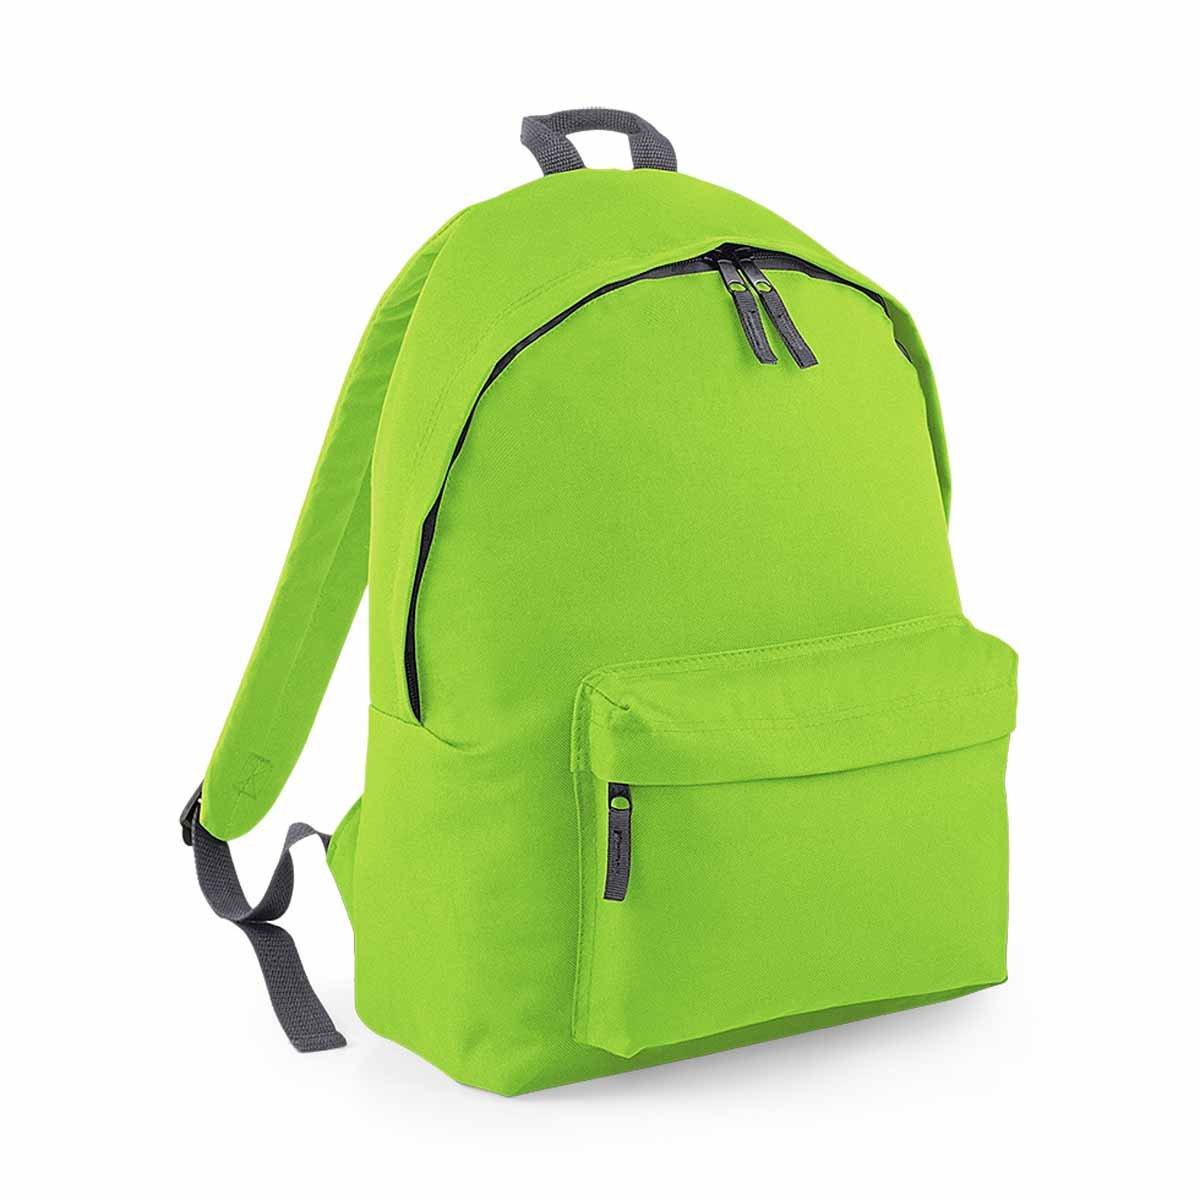 618z8UXZNCL - Bag Base–Mochila junior Fashion escuela Loisirs–BG125J–verde citron- 14L–niño